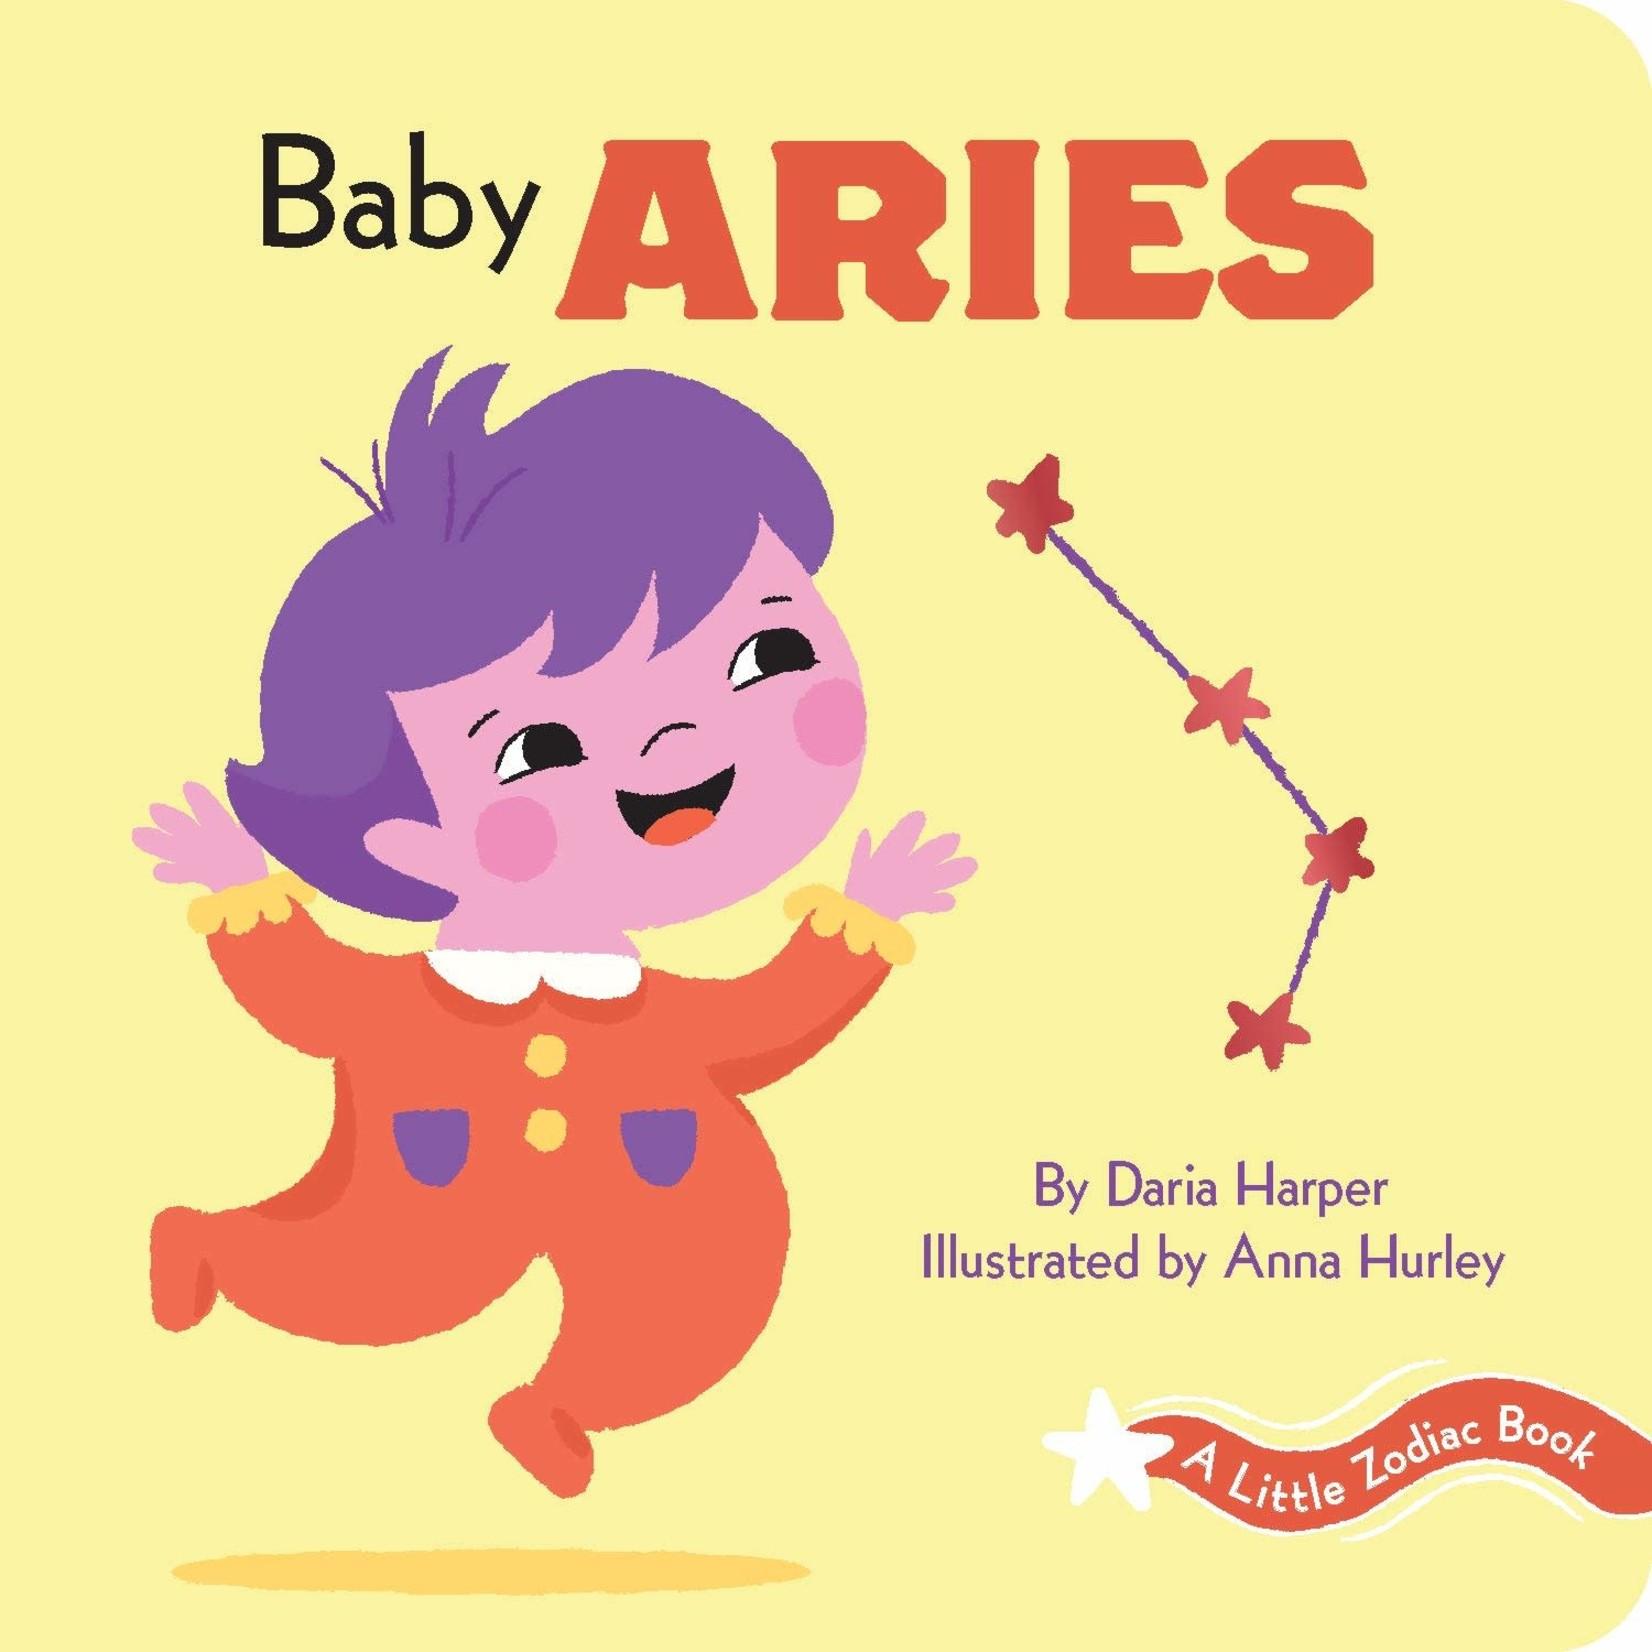 CHRONICLE LITTLE ZODIAC BOOK: BABY ARIES